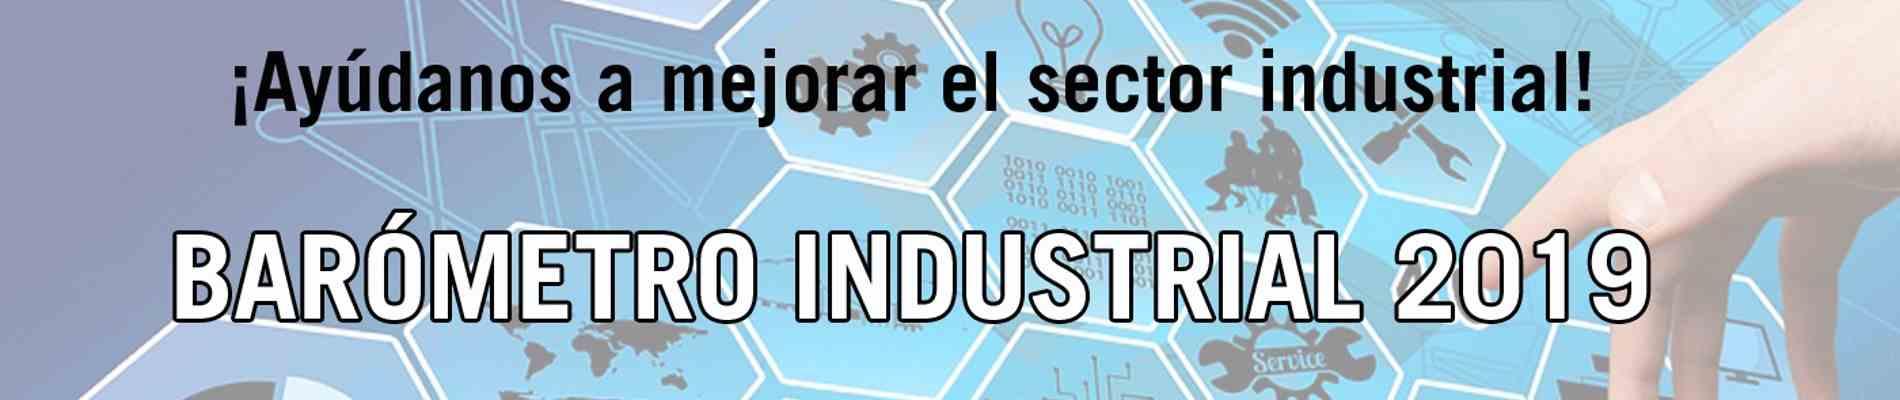 Barómetro Industrial 2019